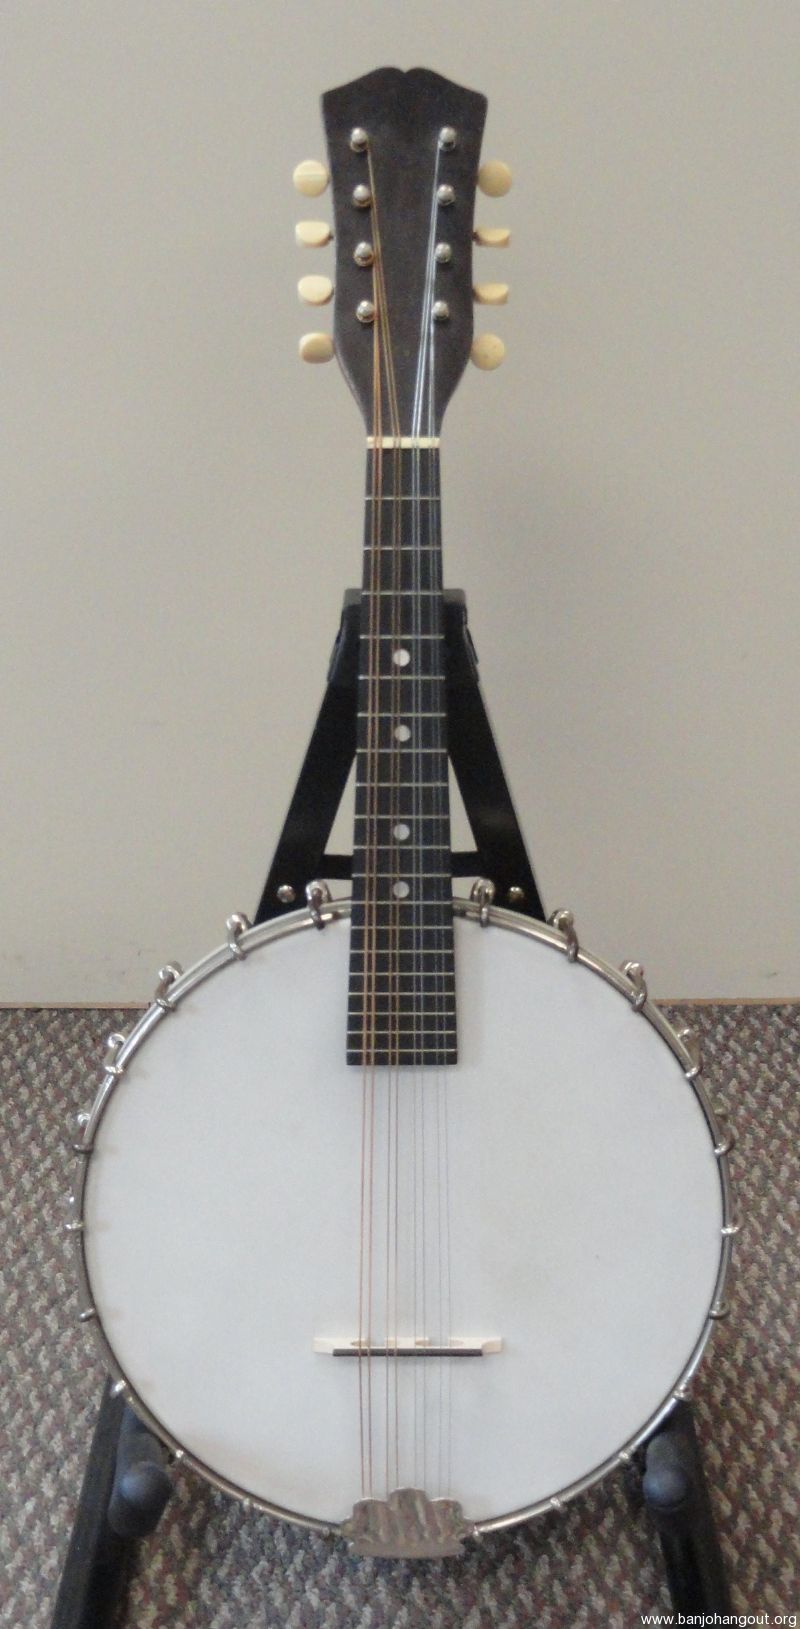 1922 Vega Banjo Mandolin - Used Banjo For Sale at BanjoBuyer com